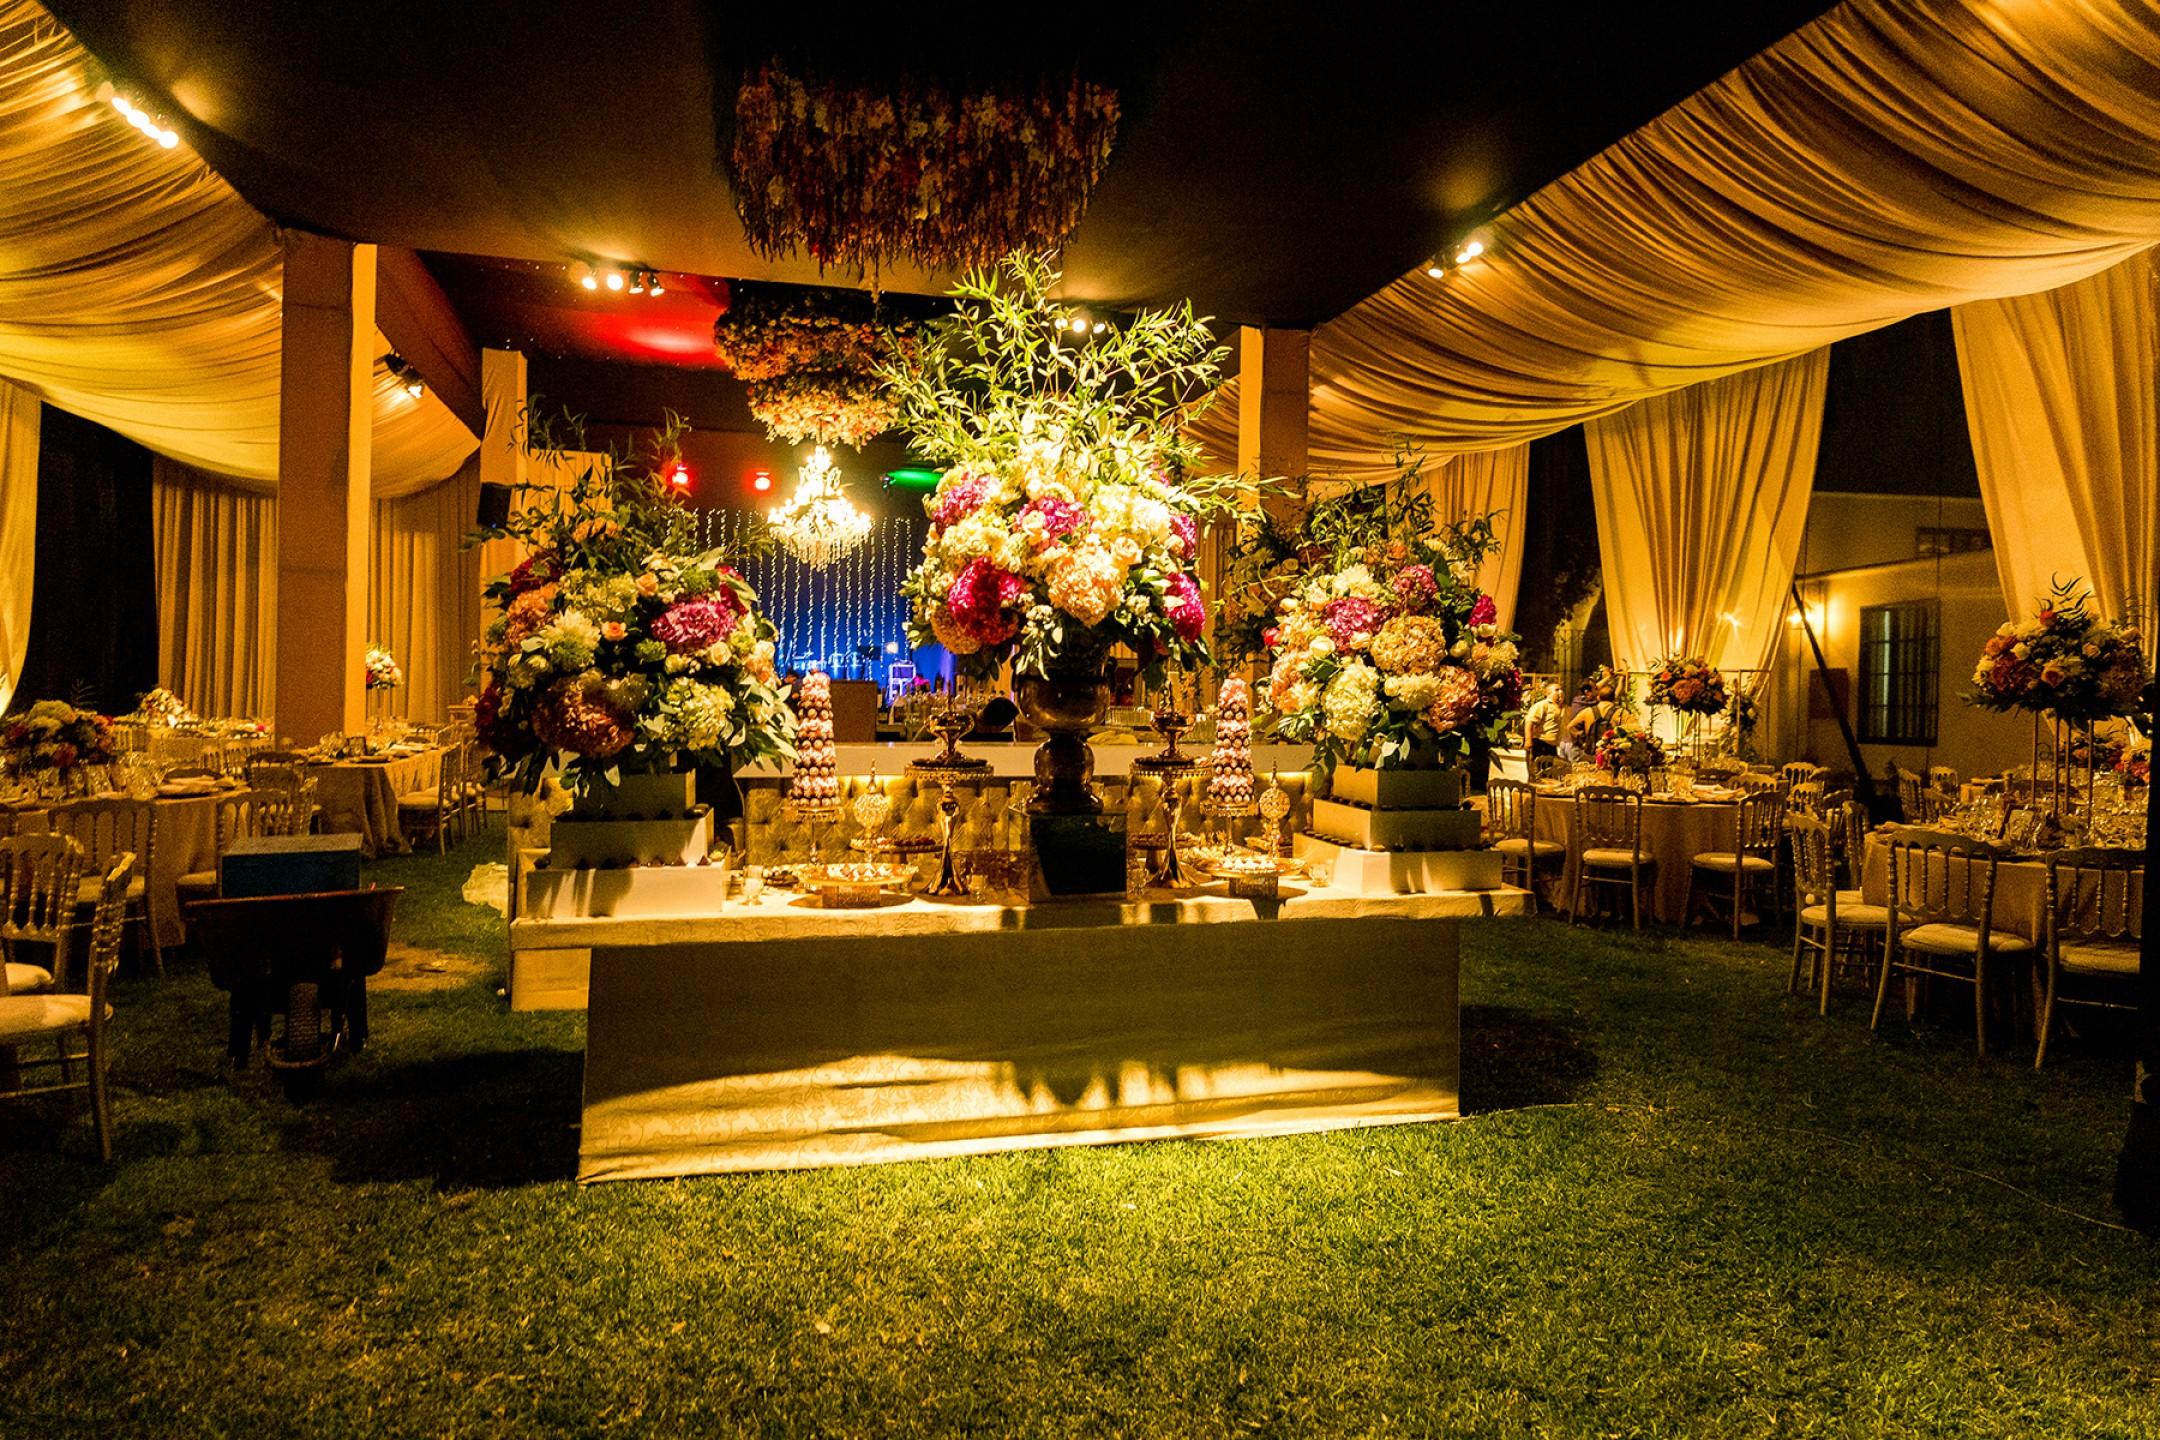 http://haciendabocanegra.com/images/chbn_OZtXql8rRM_large-1080_4ZtR4.jpg